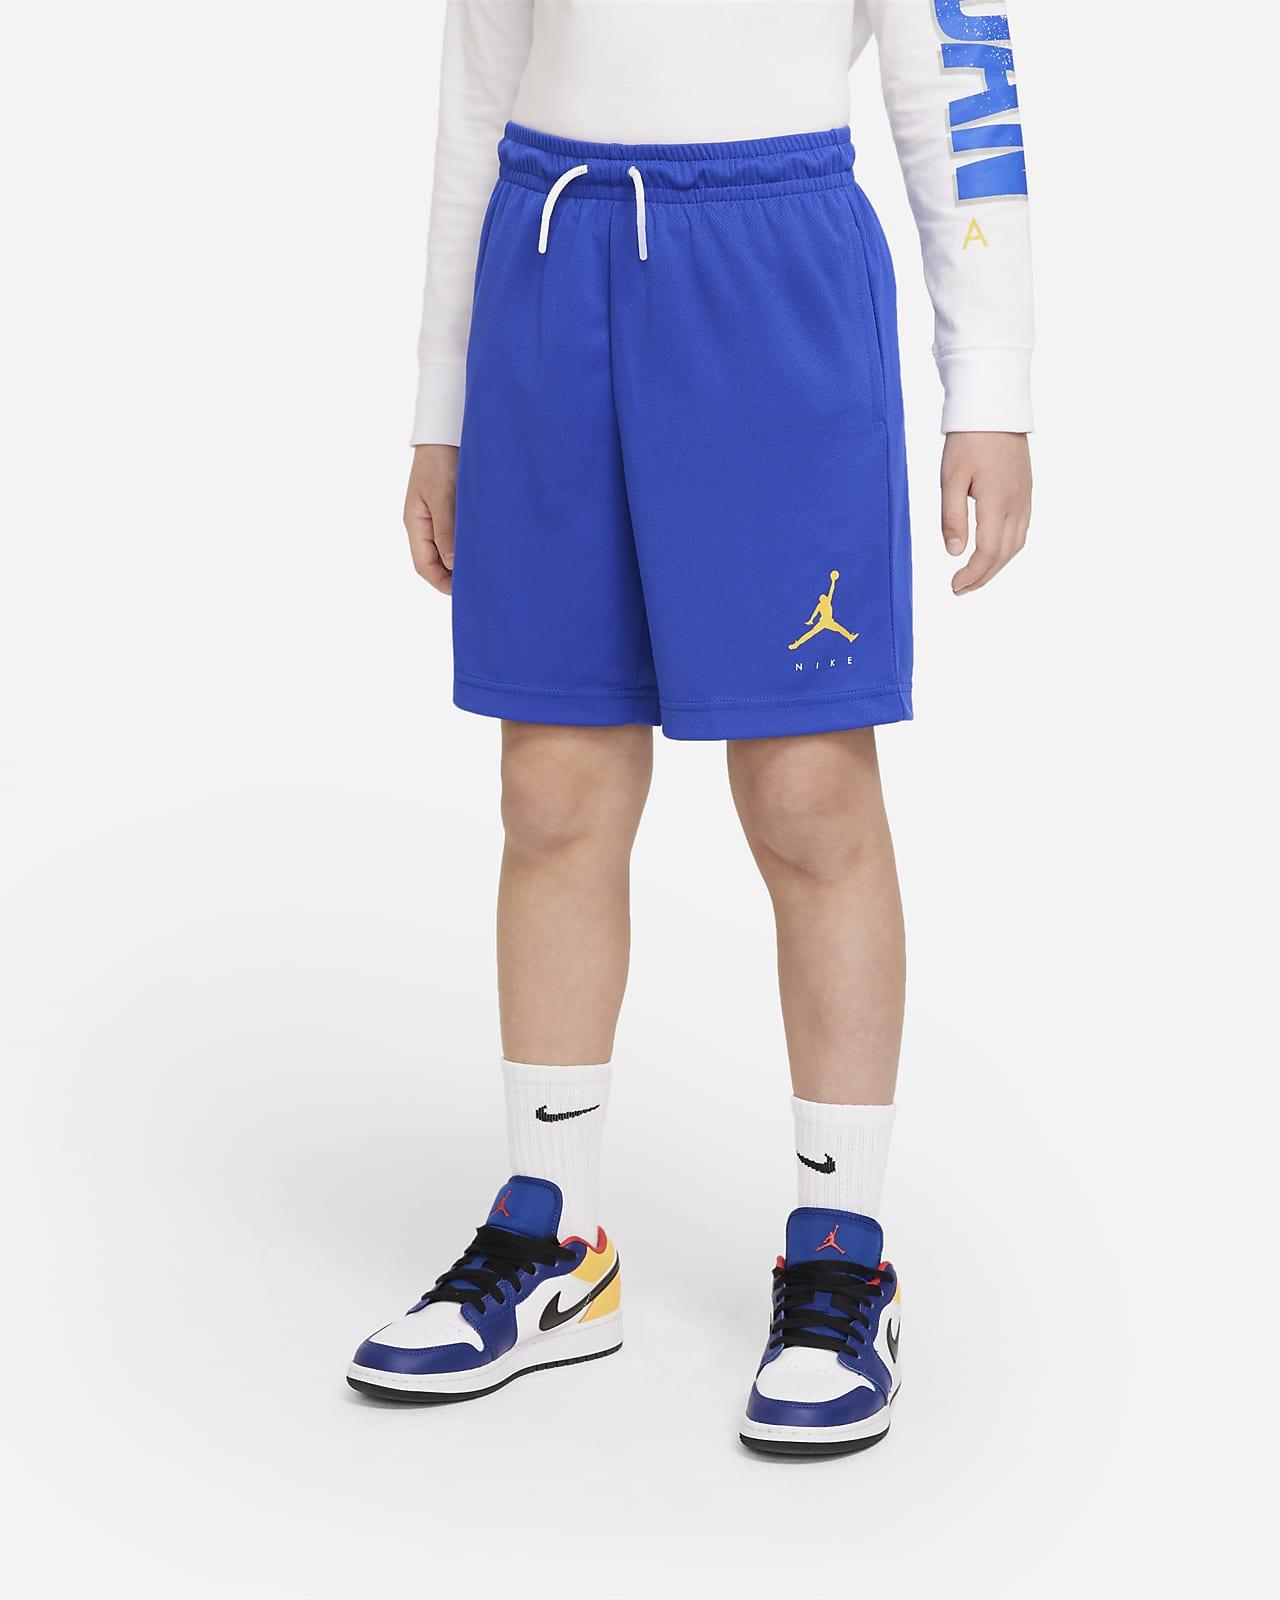 Jordan Older Kids' (Boys') Mesh Shorts